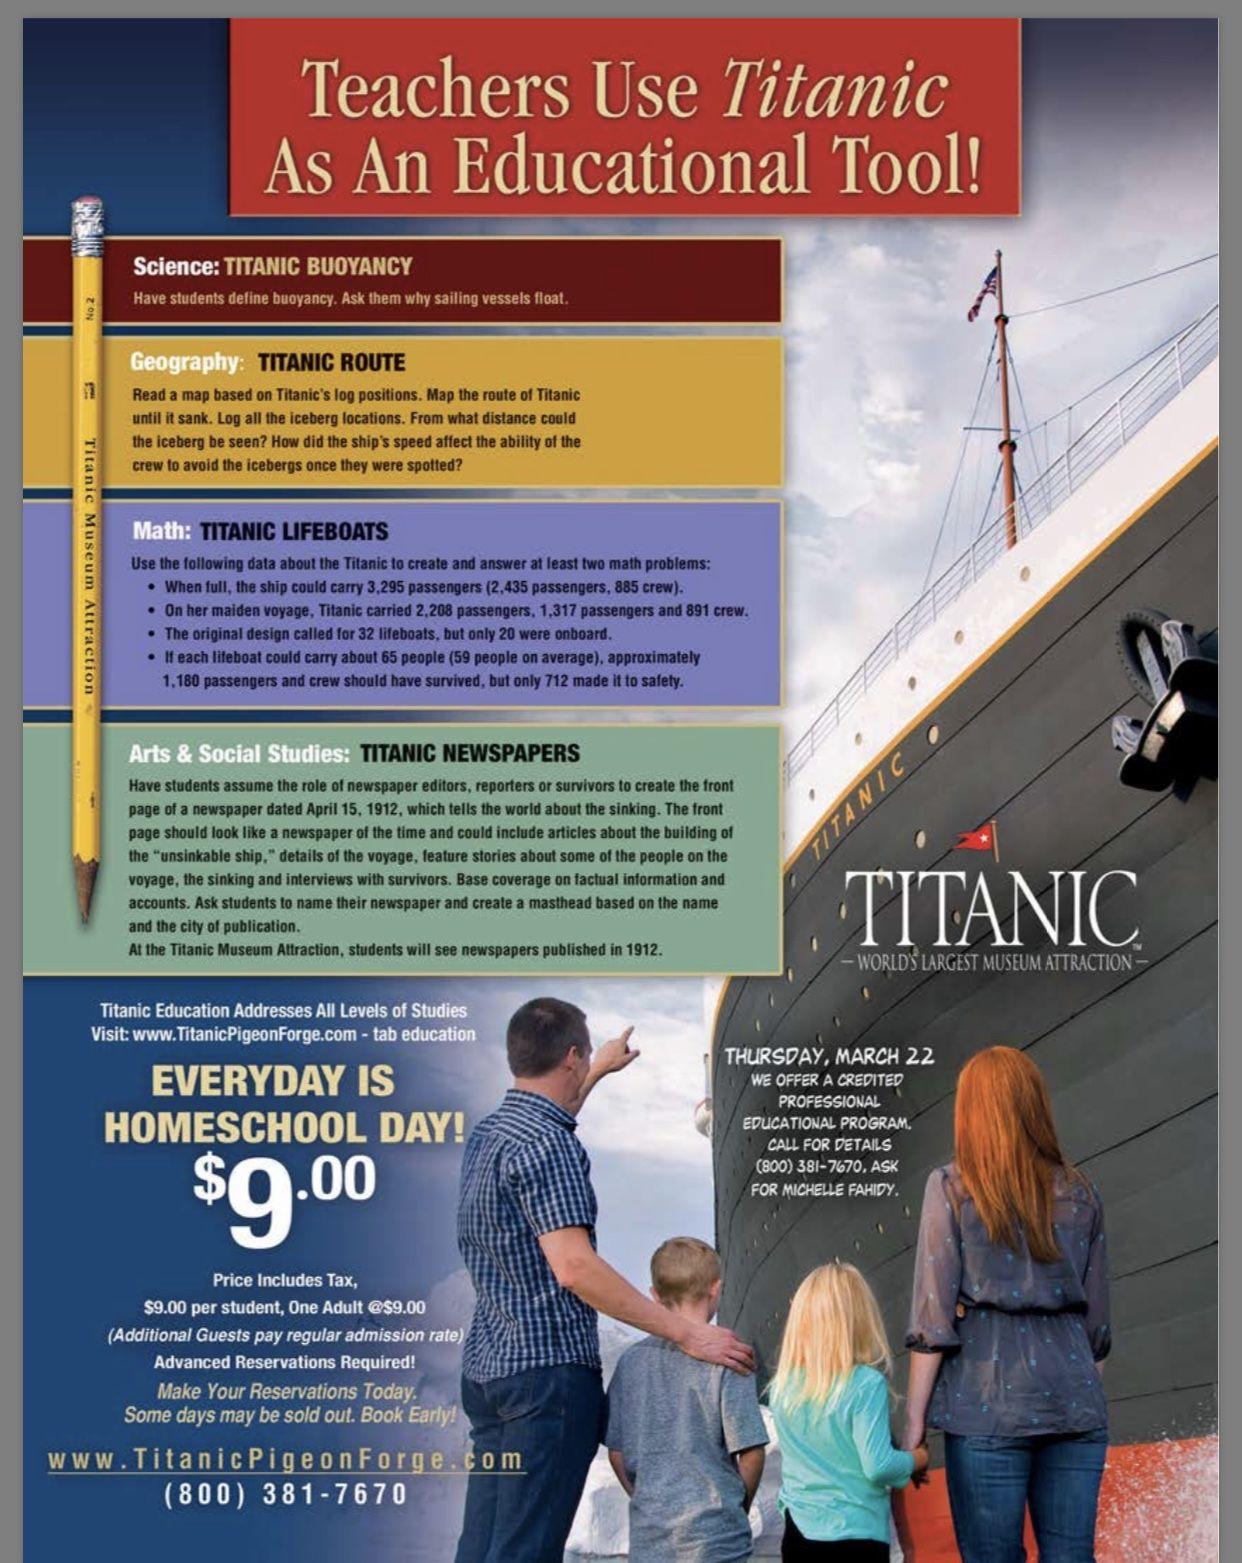 Titanic Pigeon Forge Homeschool Day